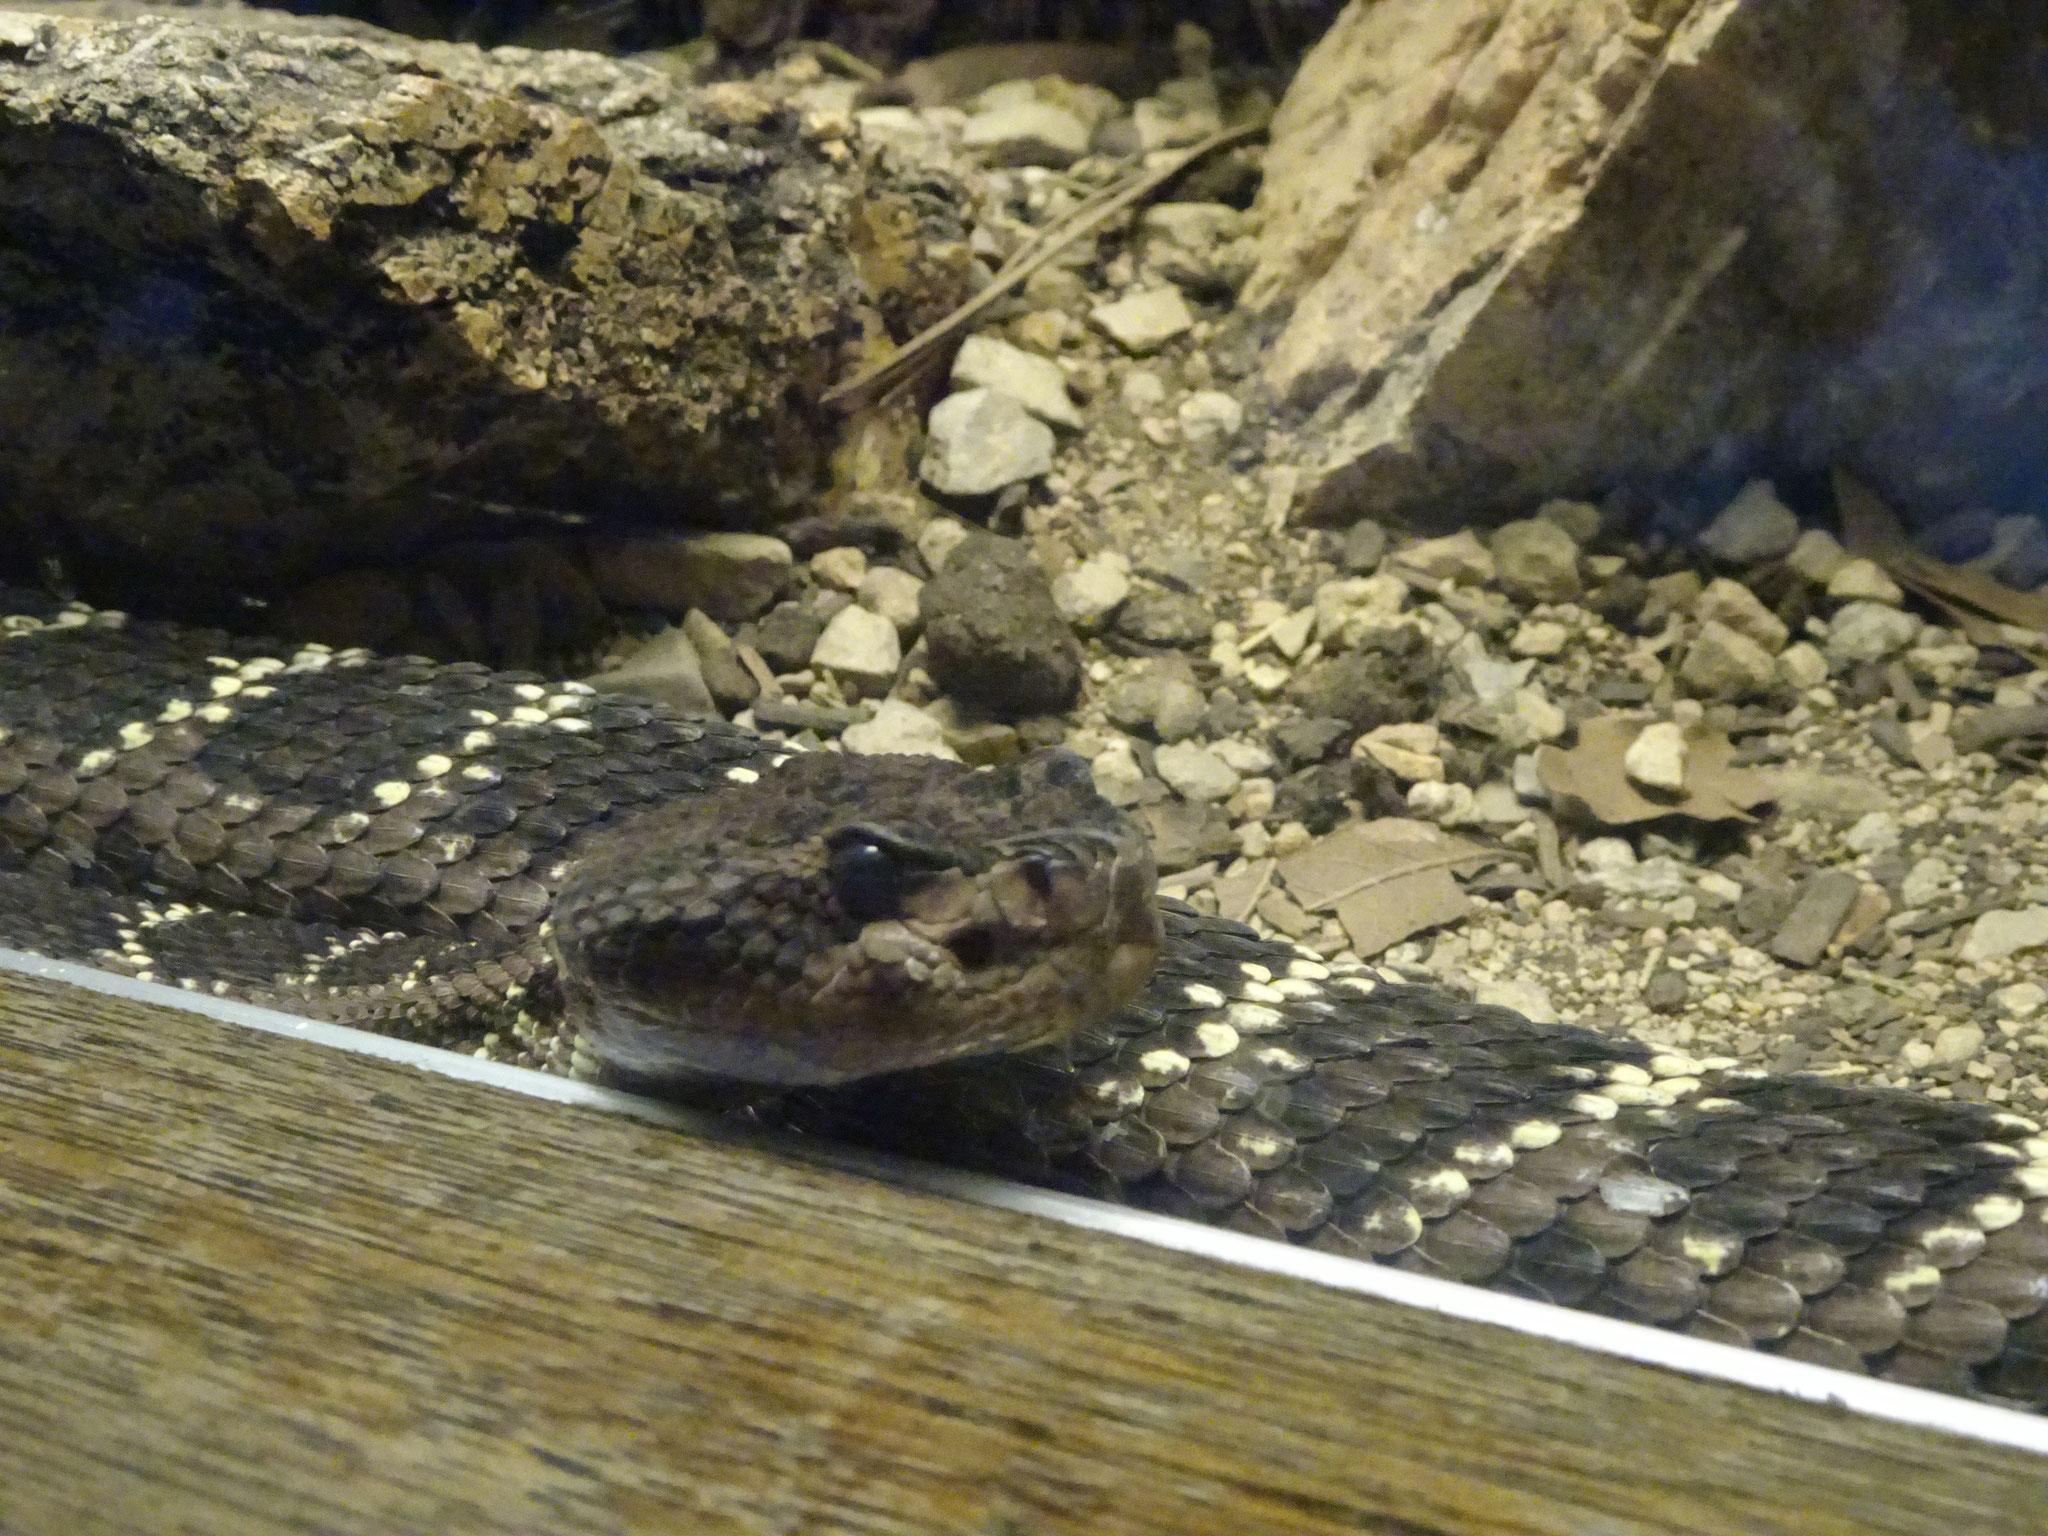 Serpent de l'Arizona-Sonora Désert Museum